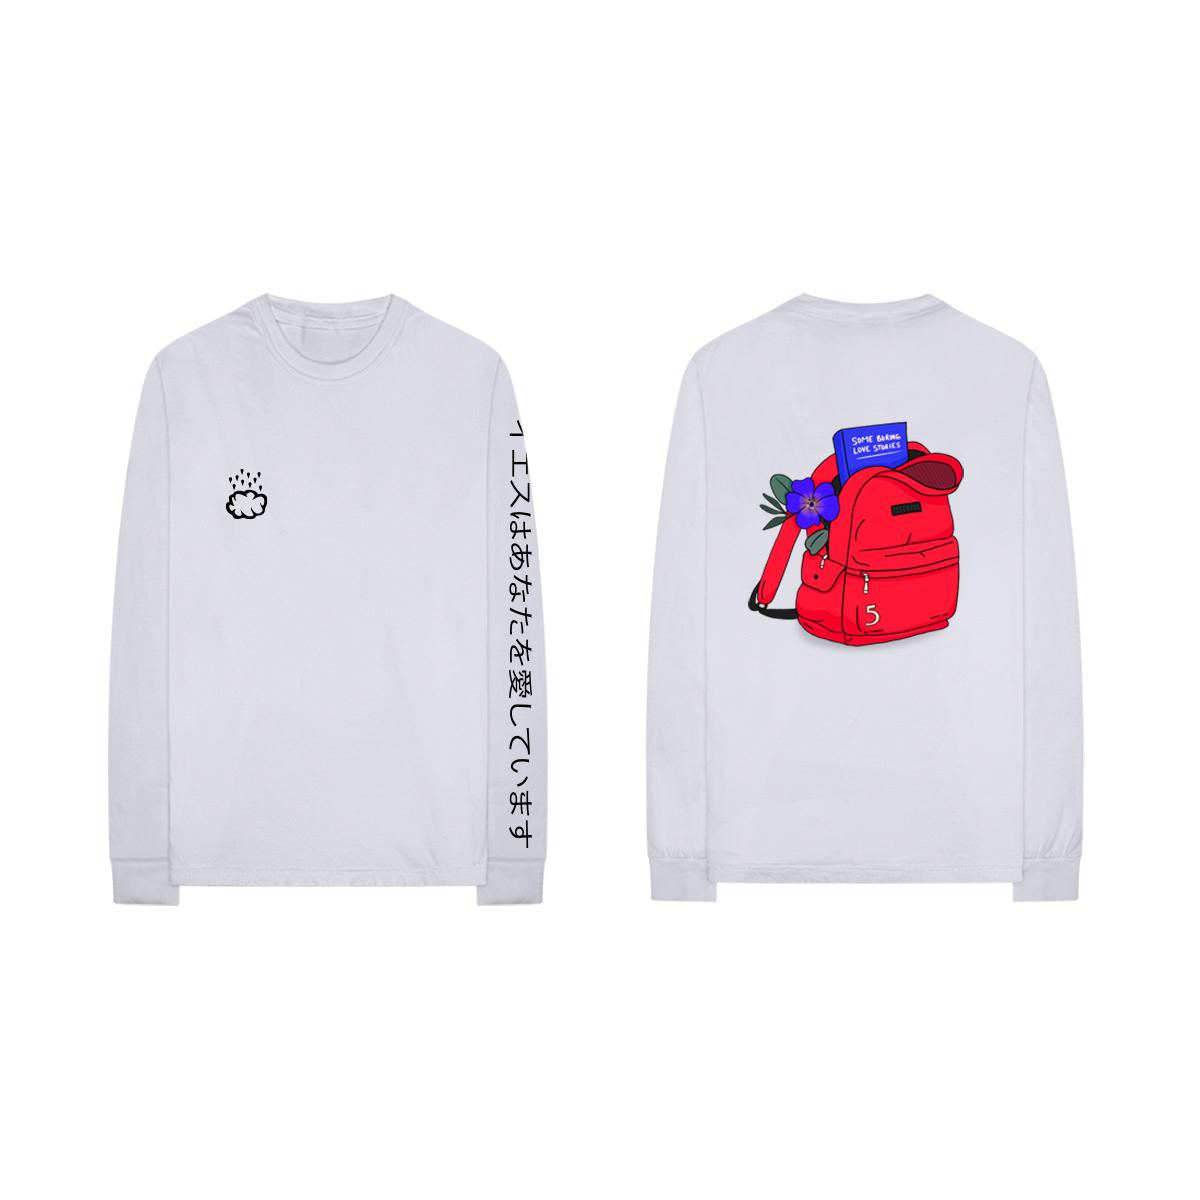 Powfu White Long-Sleeve T-Shirt